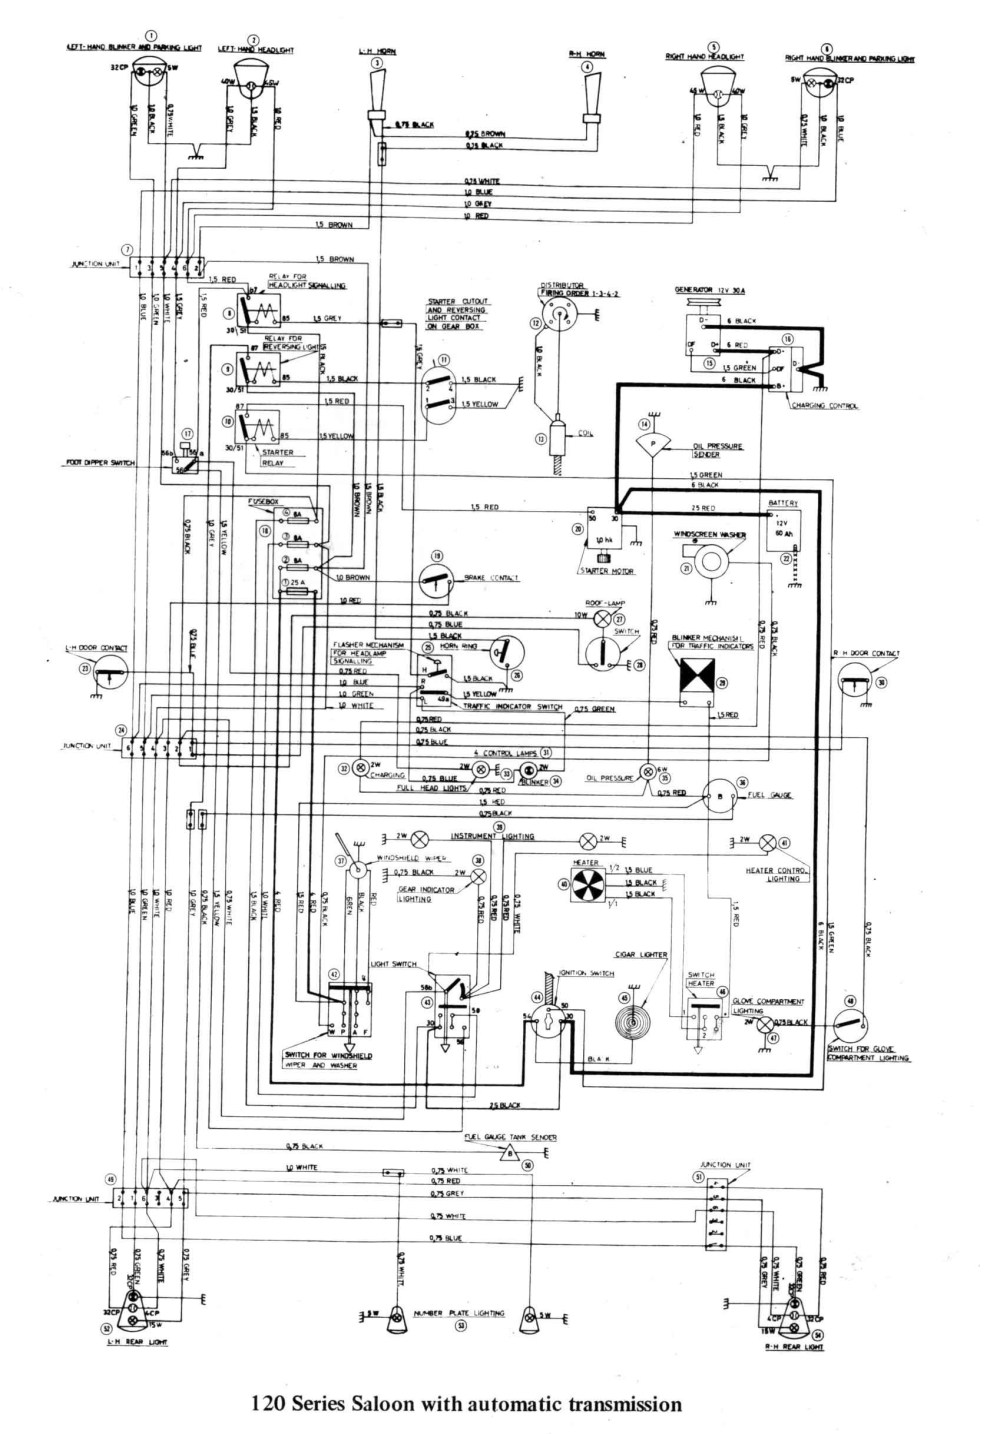 medium resolution of automotive wiring diagram practice new peterbilt model 348 359 362 wiring diagram car tuning wire center